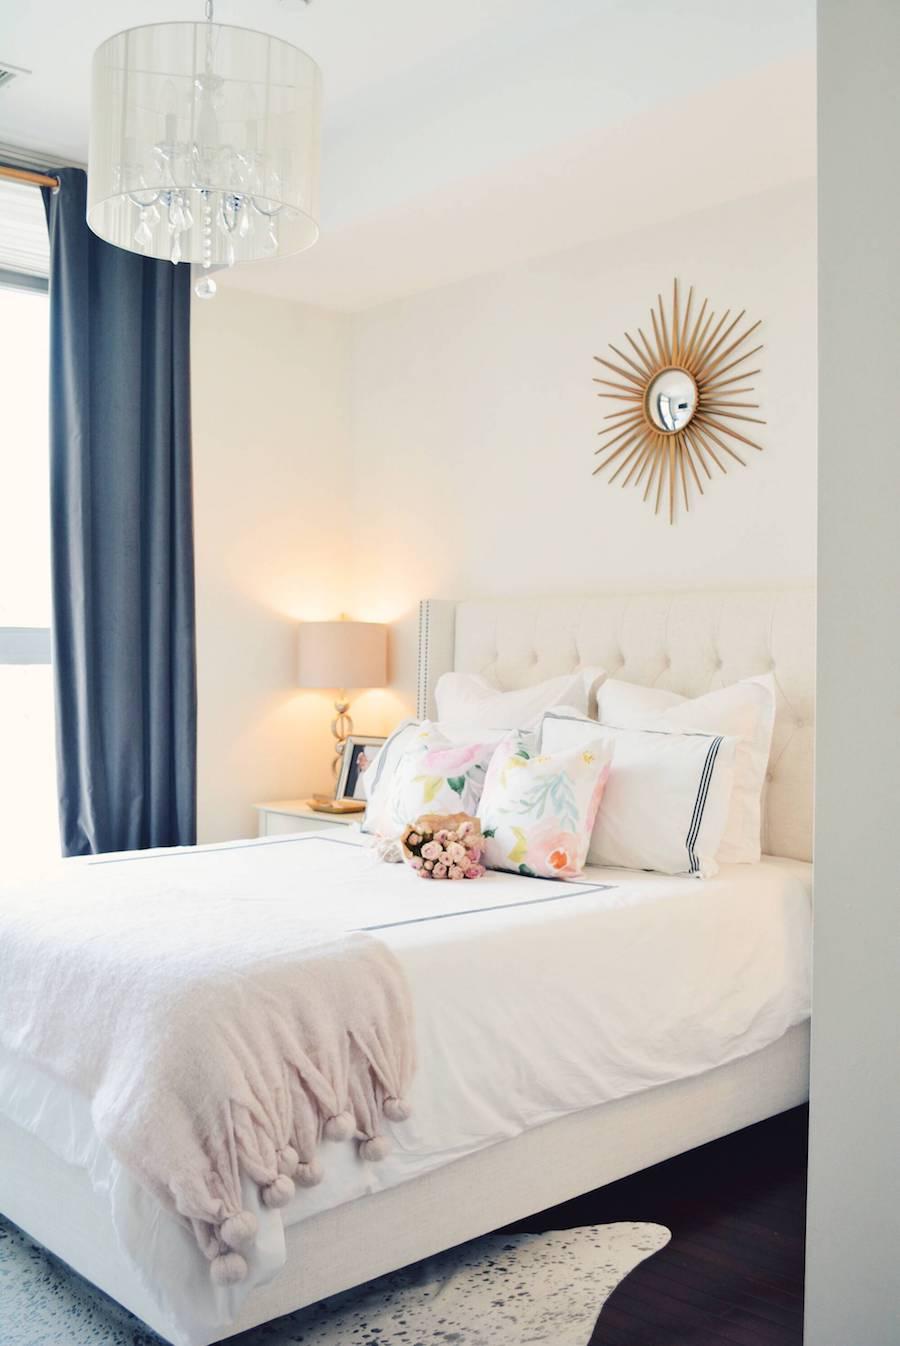 White bedroom with sunburst mirror